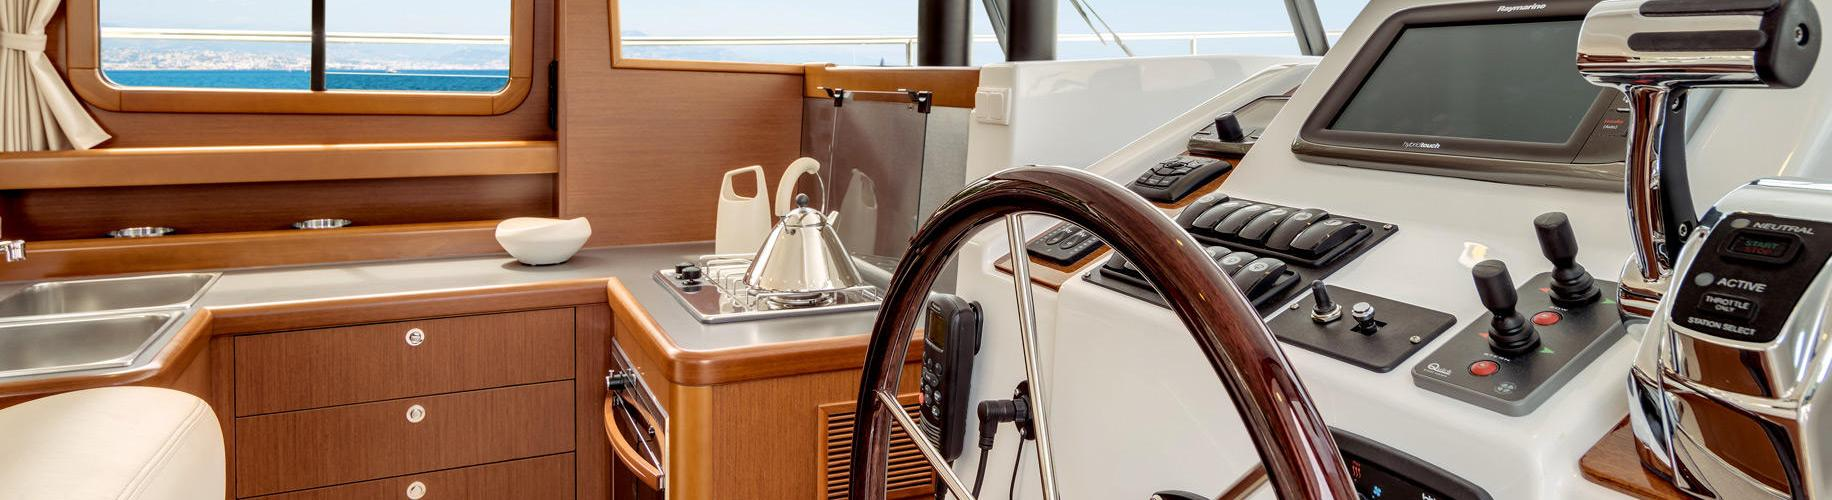 barca a motore Swift Trawler 34 Fly